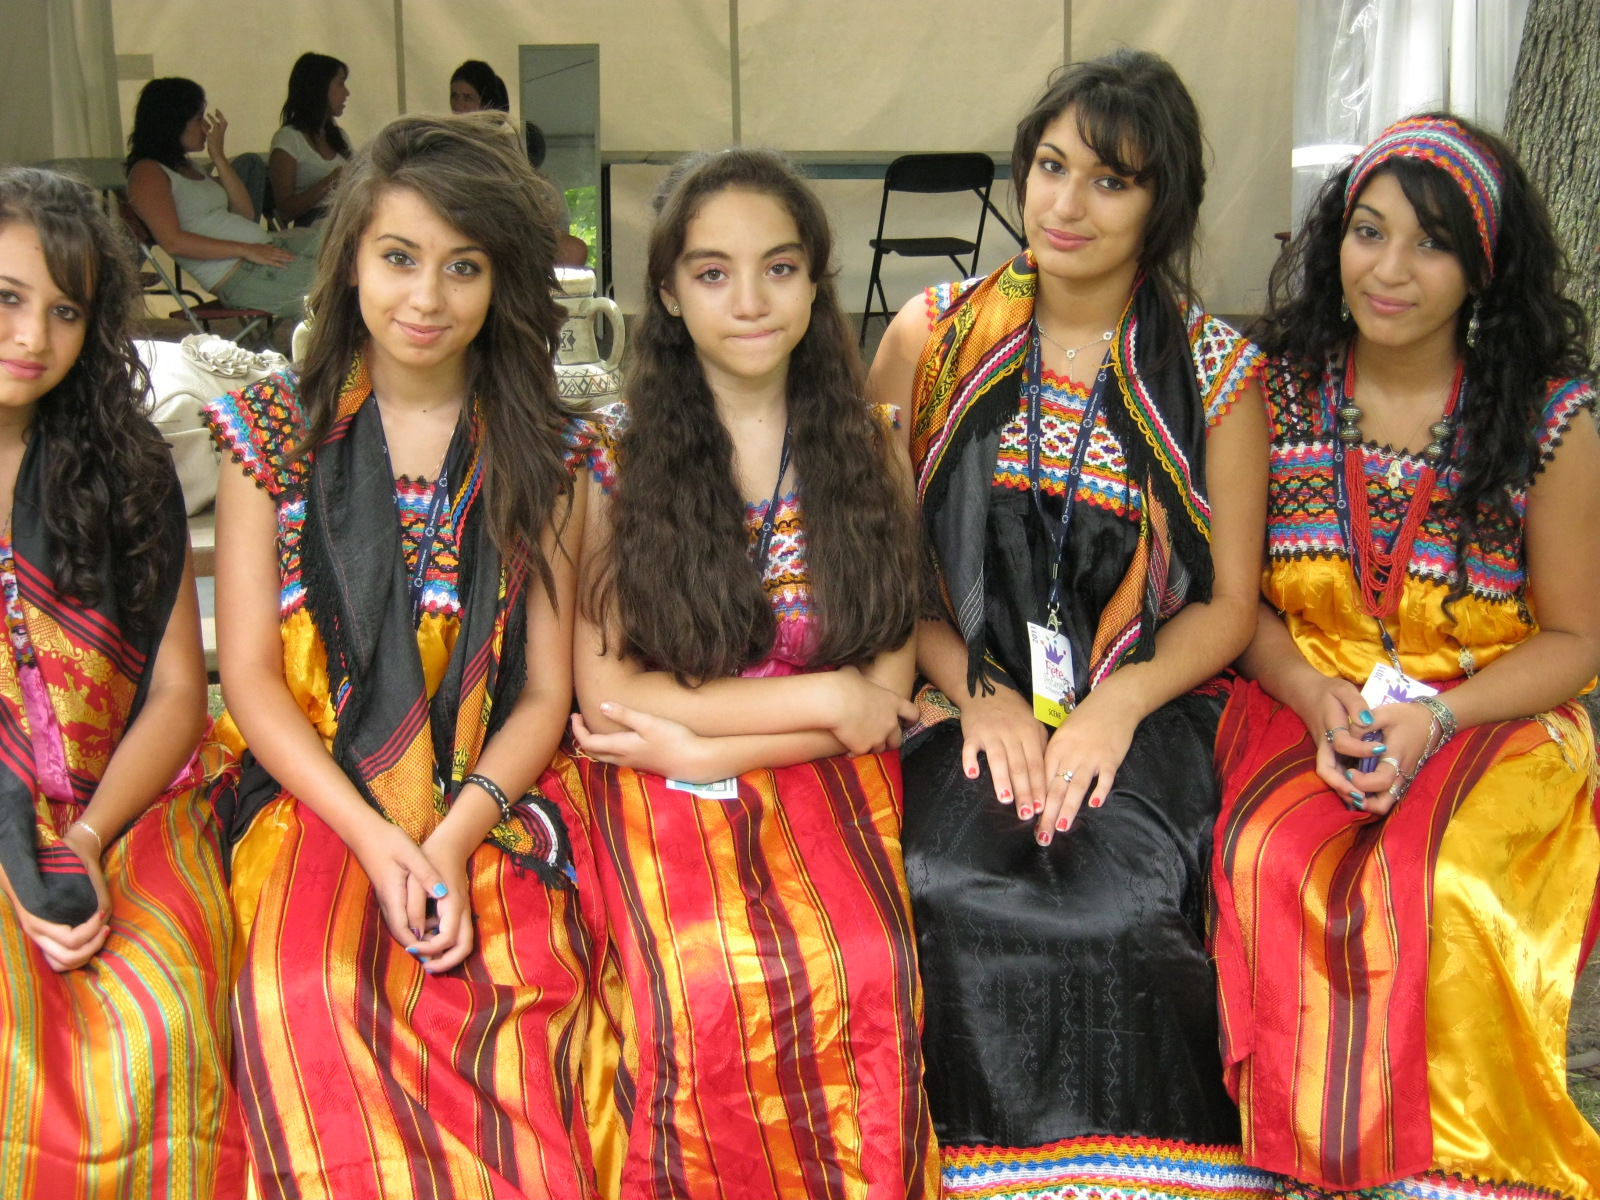 Rencontres femmes kabyles france